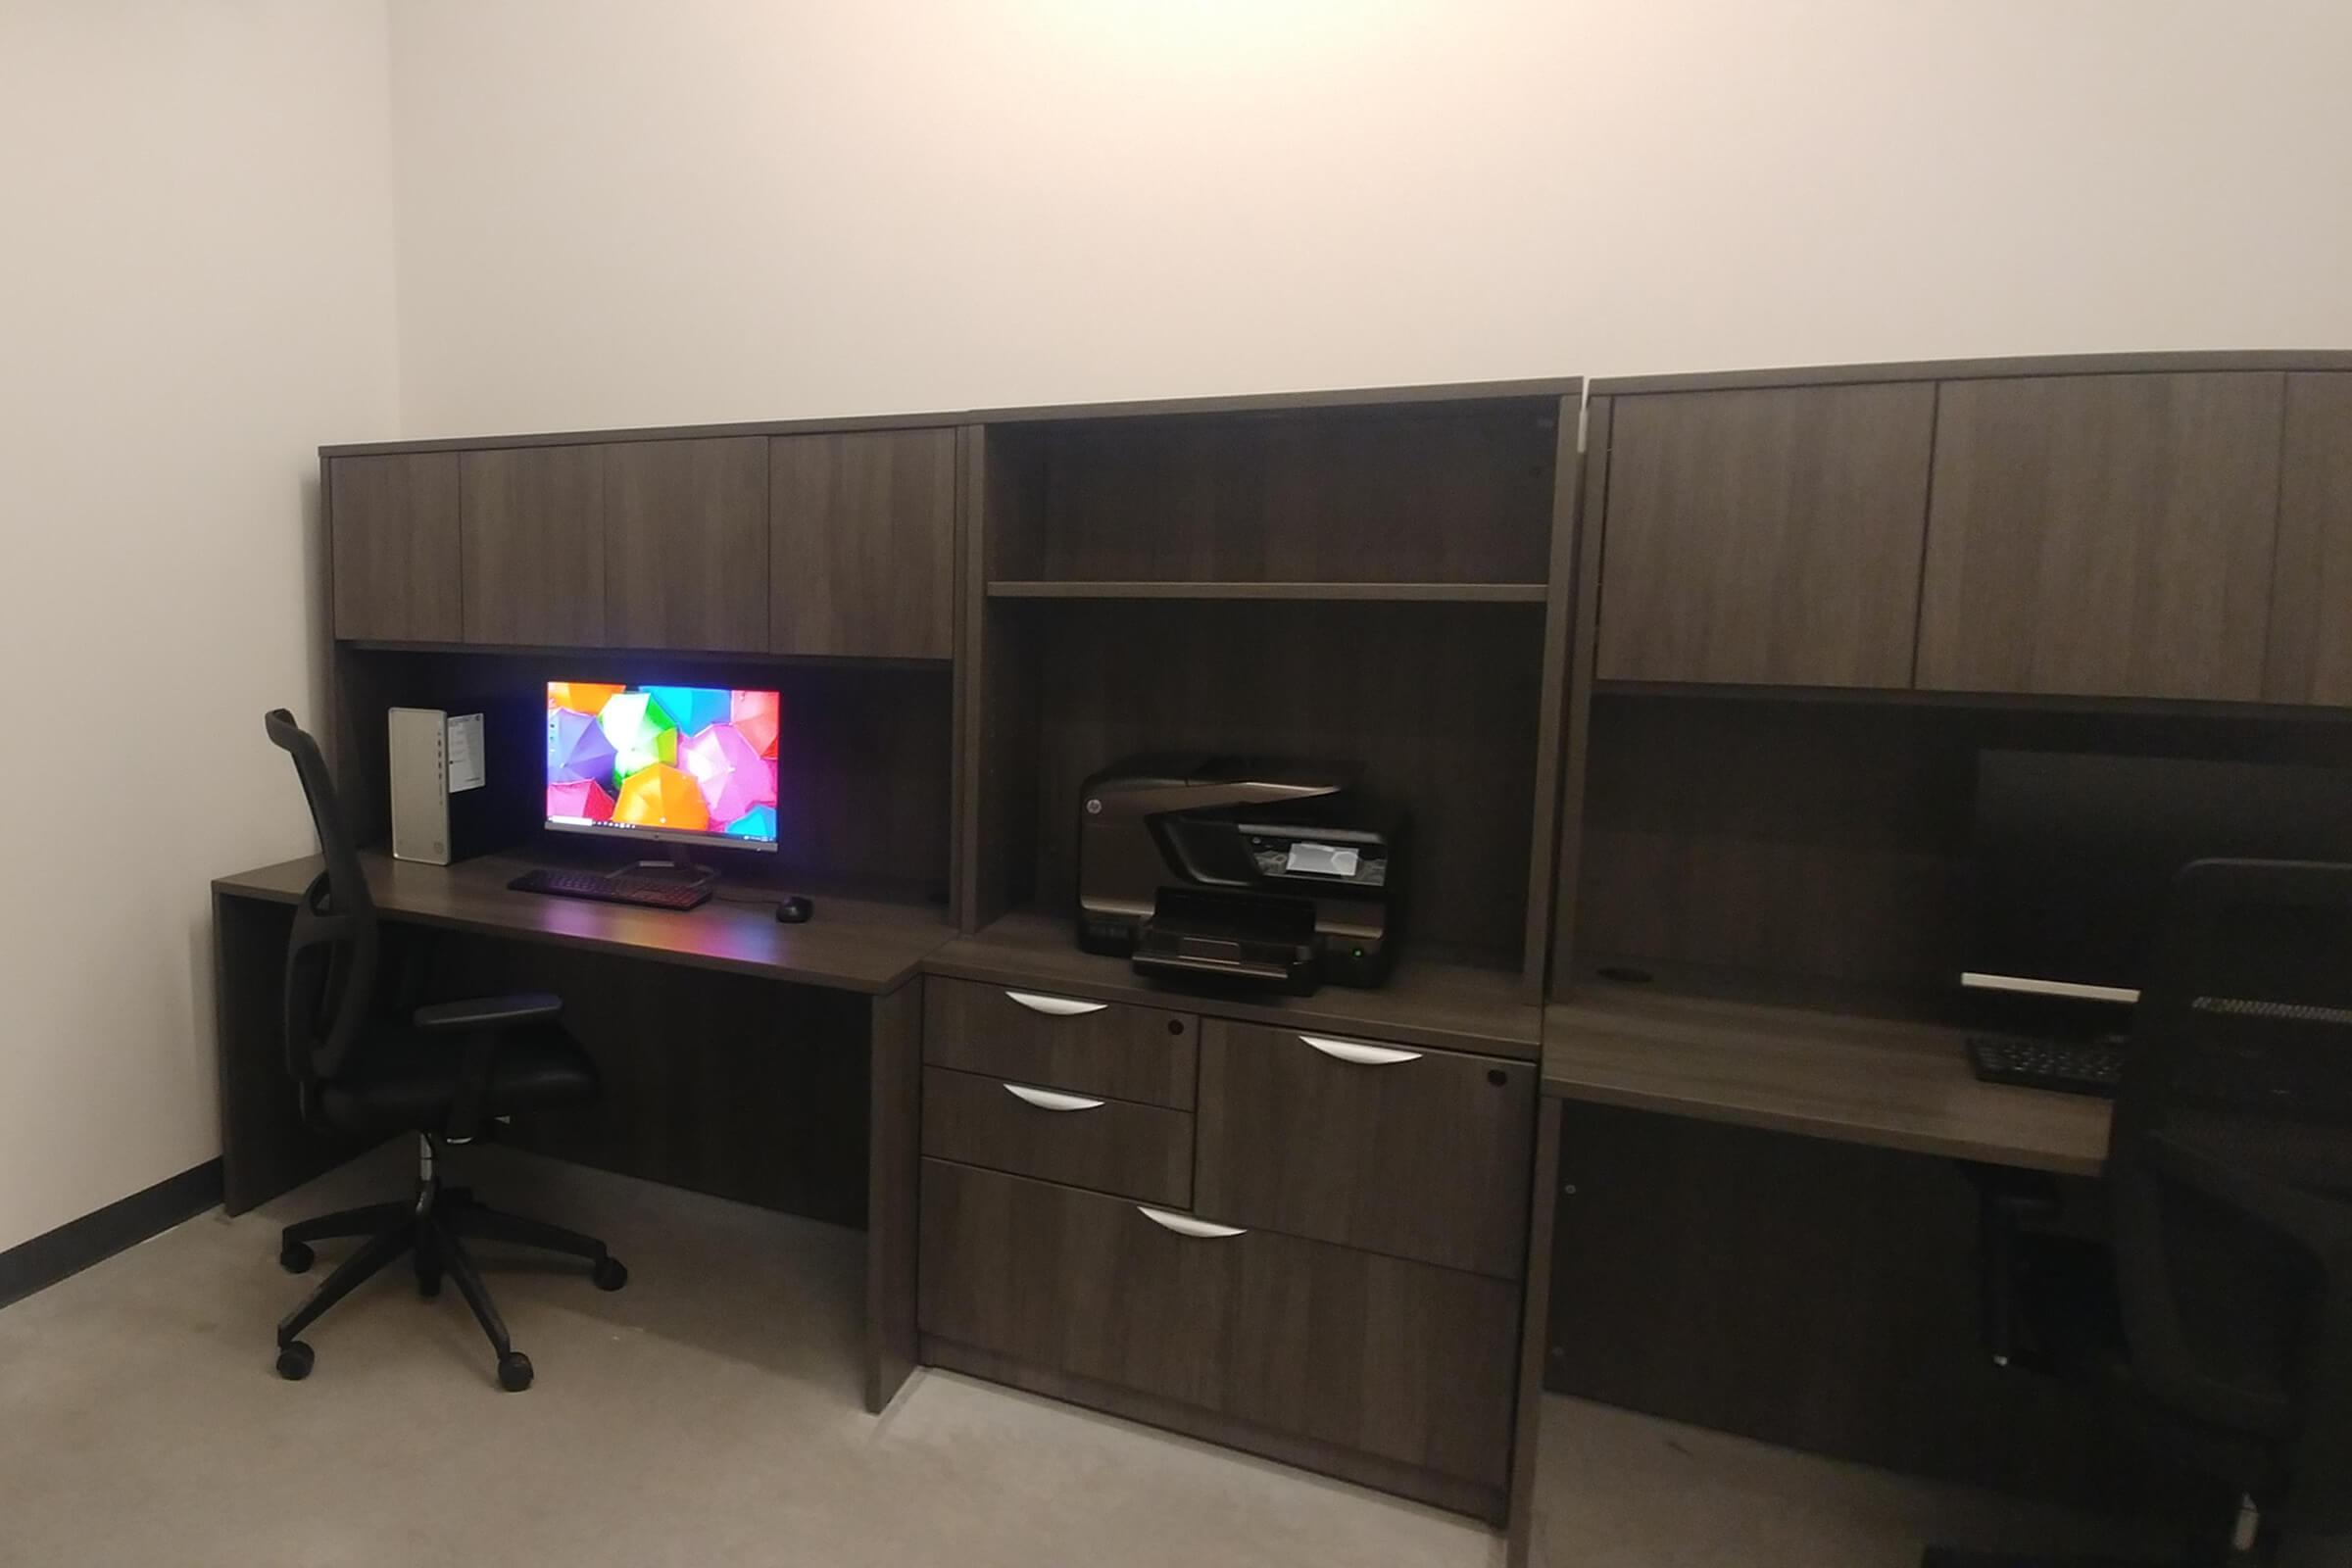 a flat screen tv sitting in a room